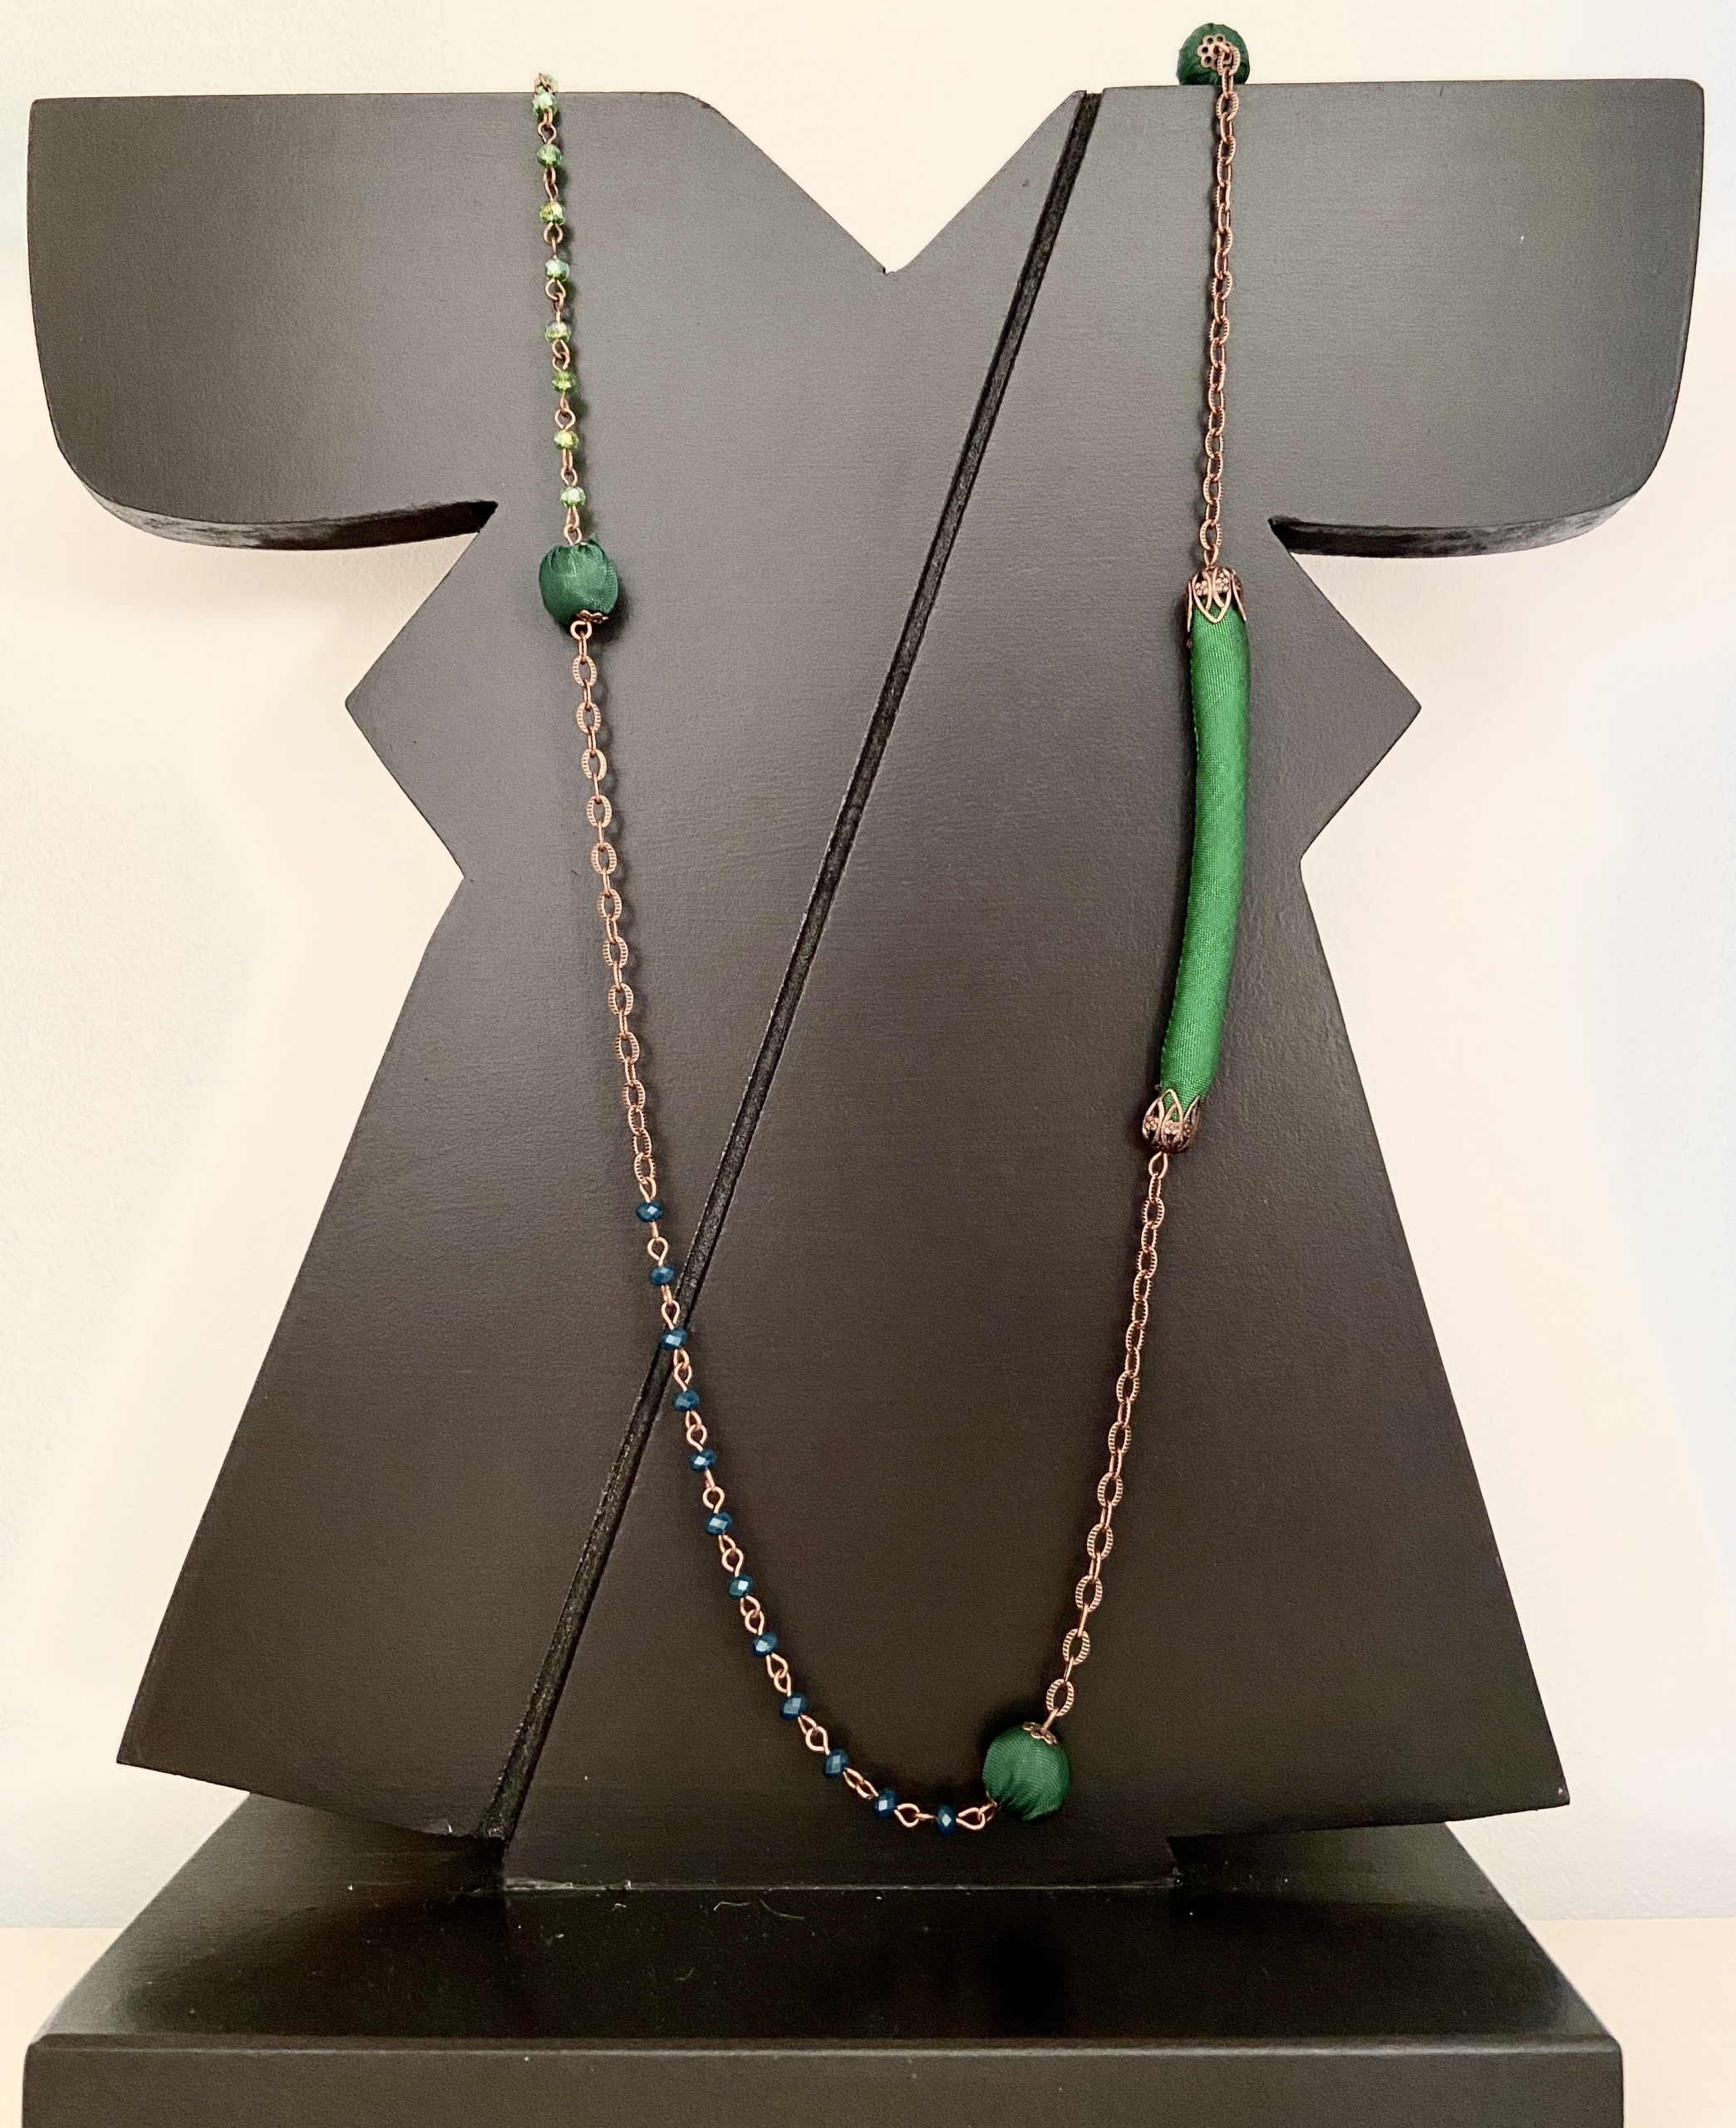 collana in rame, cristalli e shantung di seta